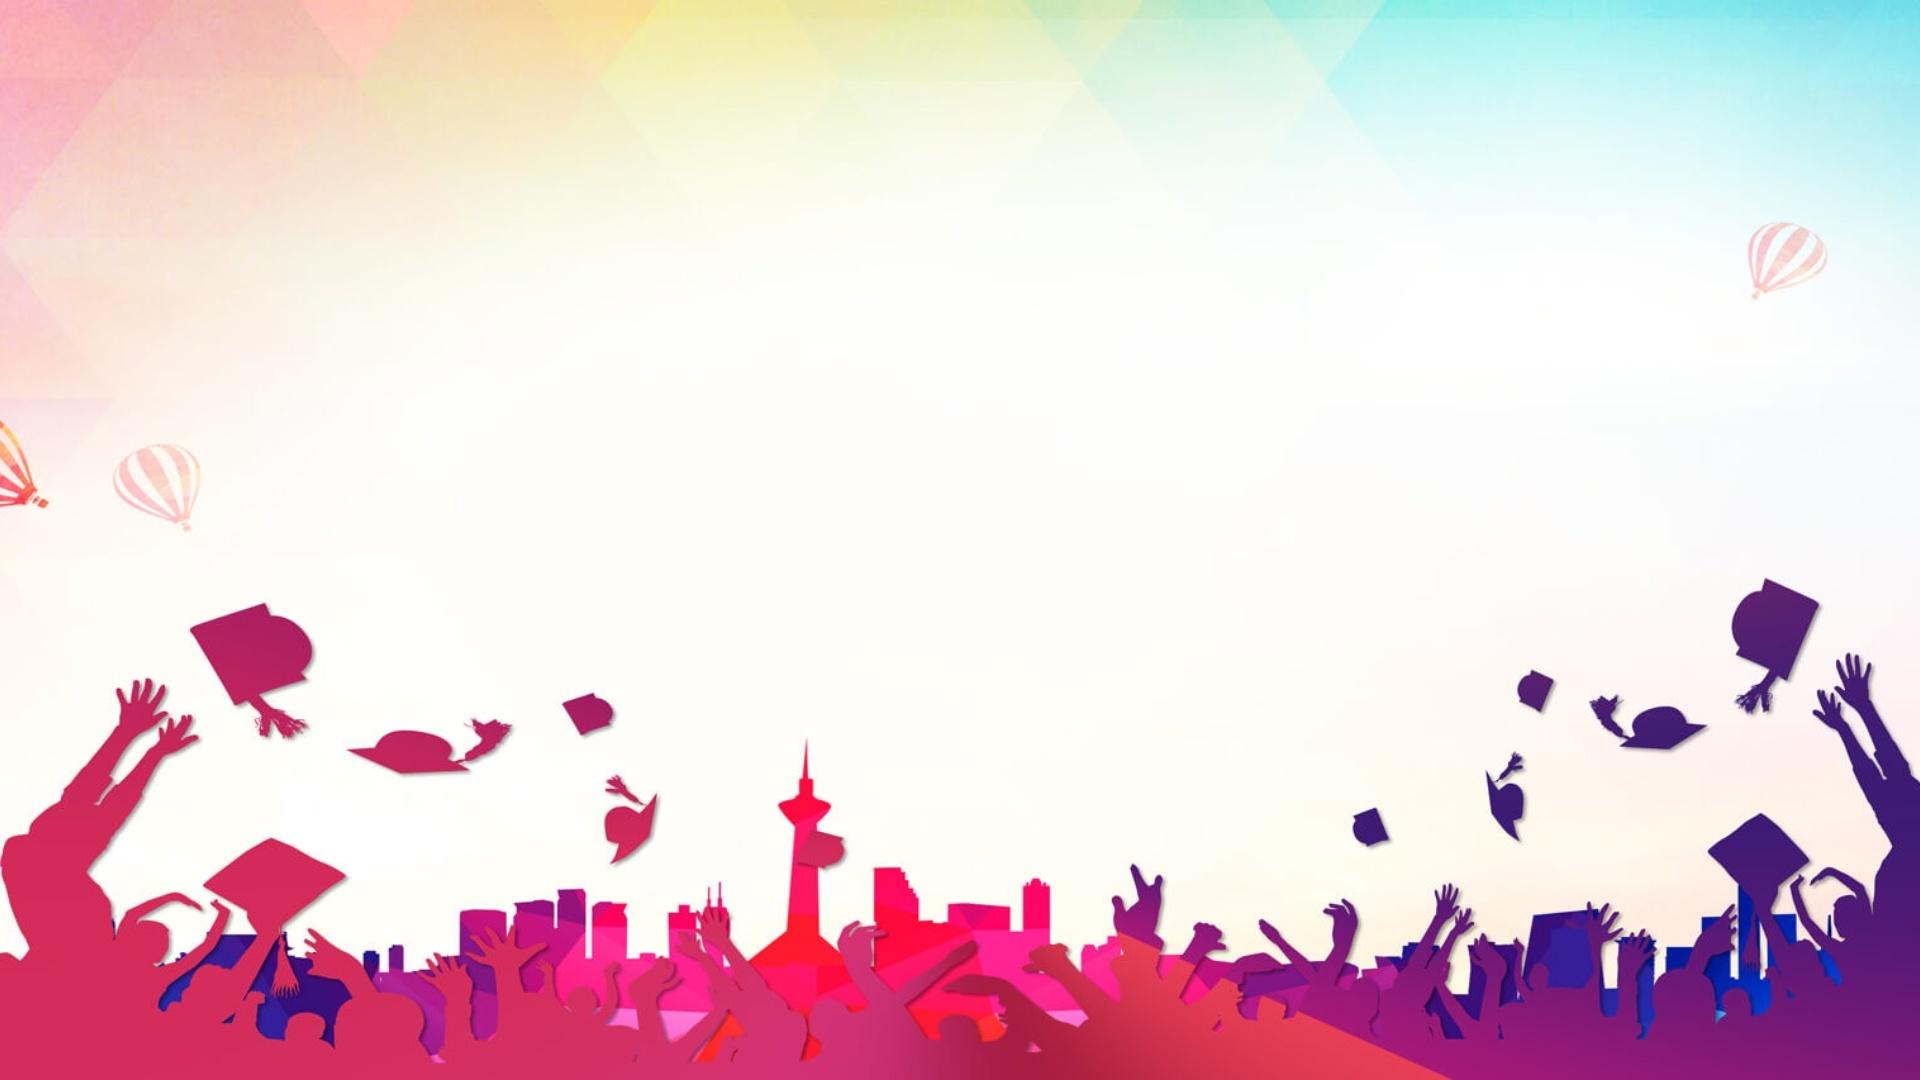 Graduation Free Wallpaper